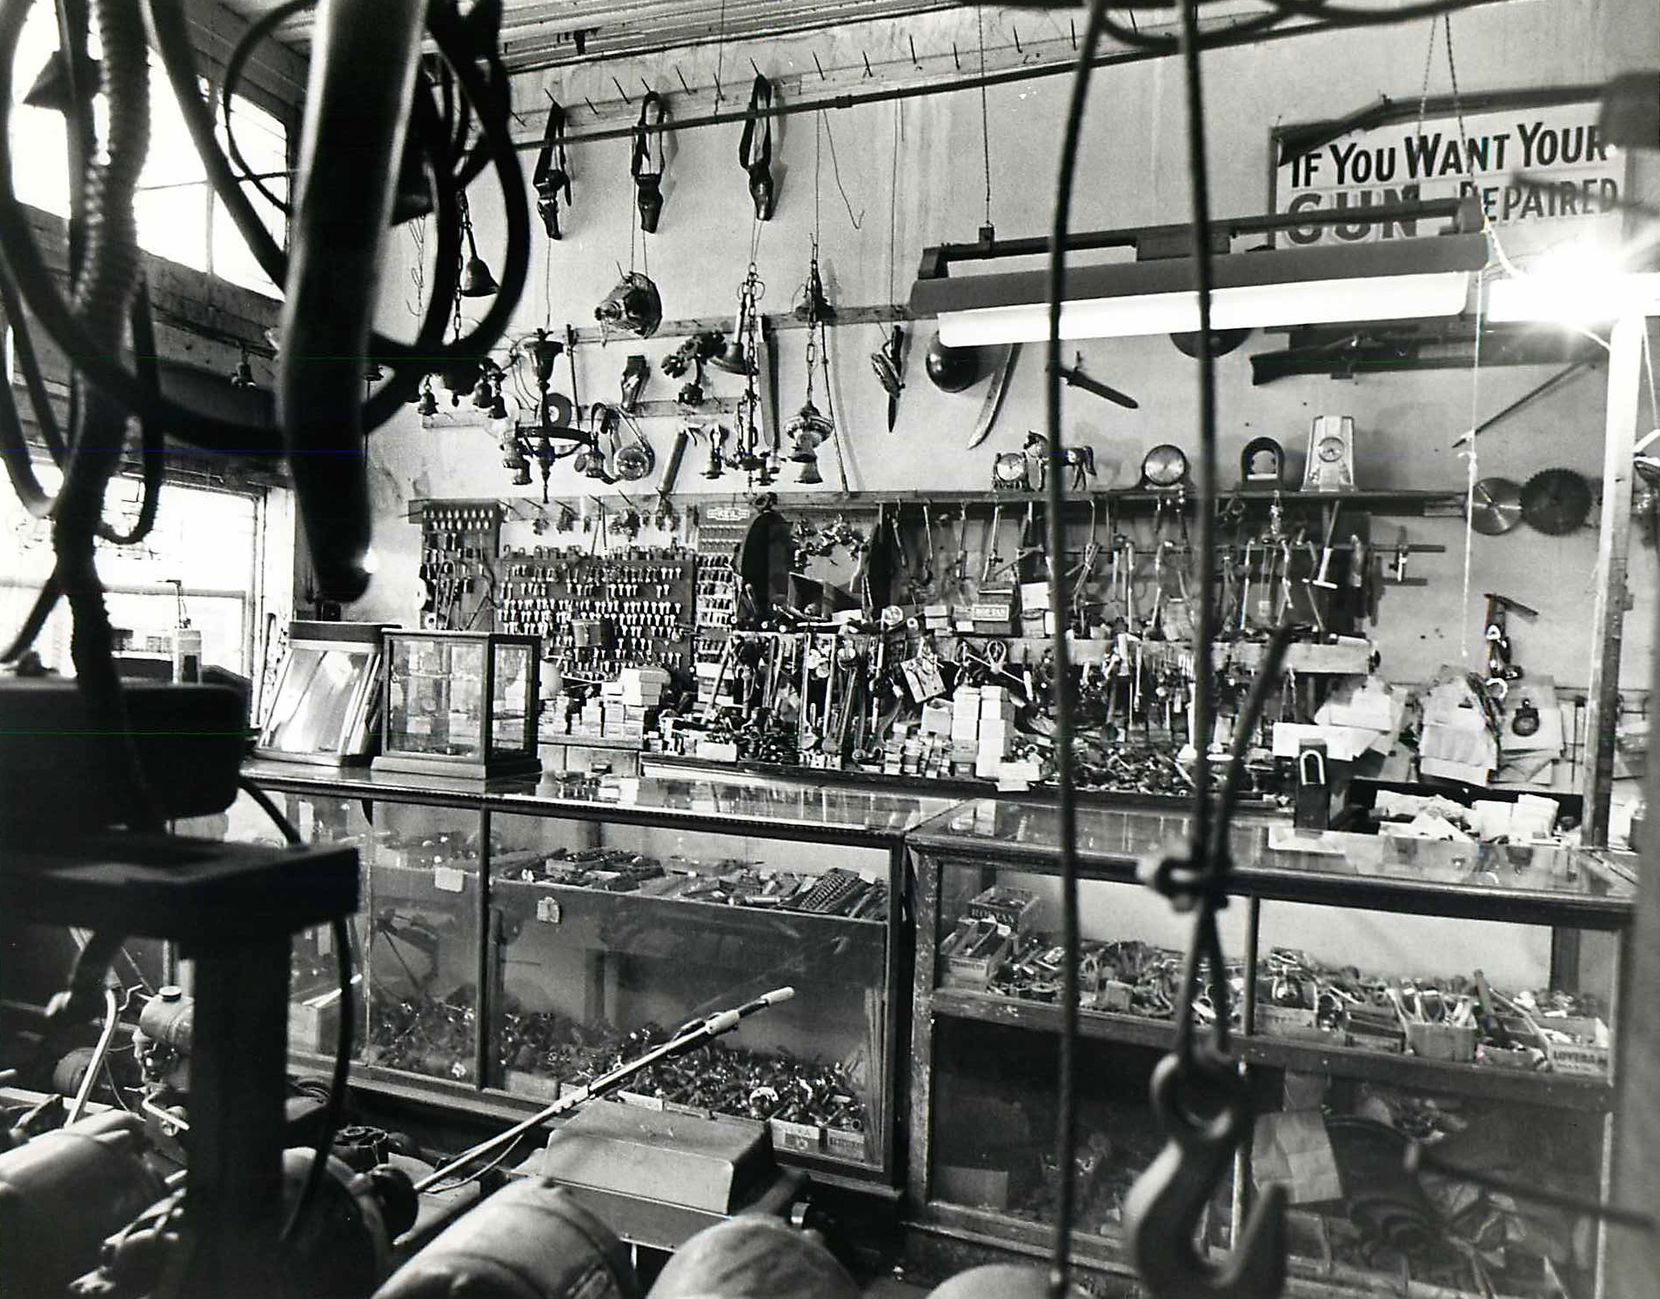 Jan. 15, 1971 - Pawnshop in Deep Ellum.